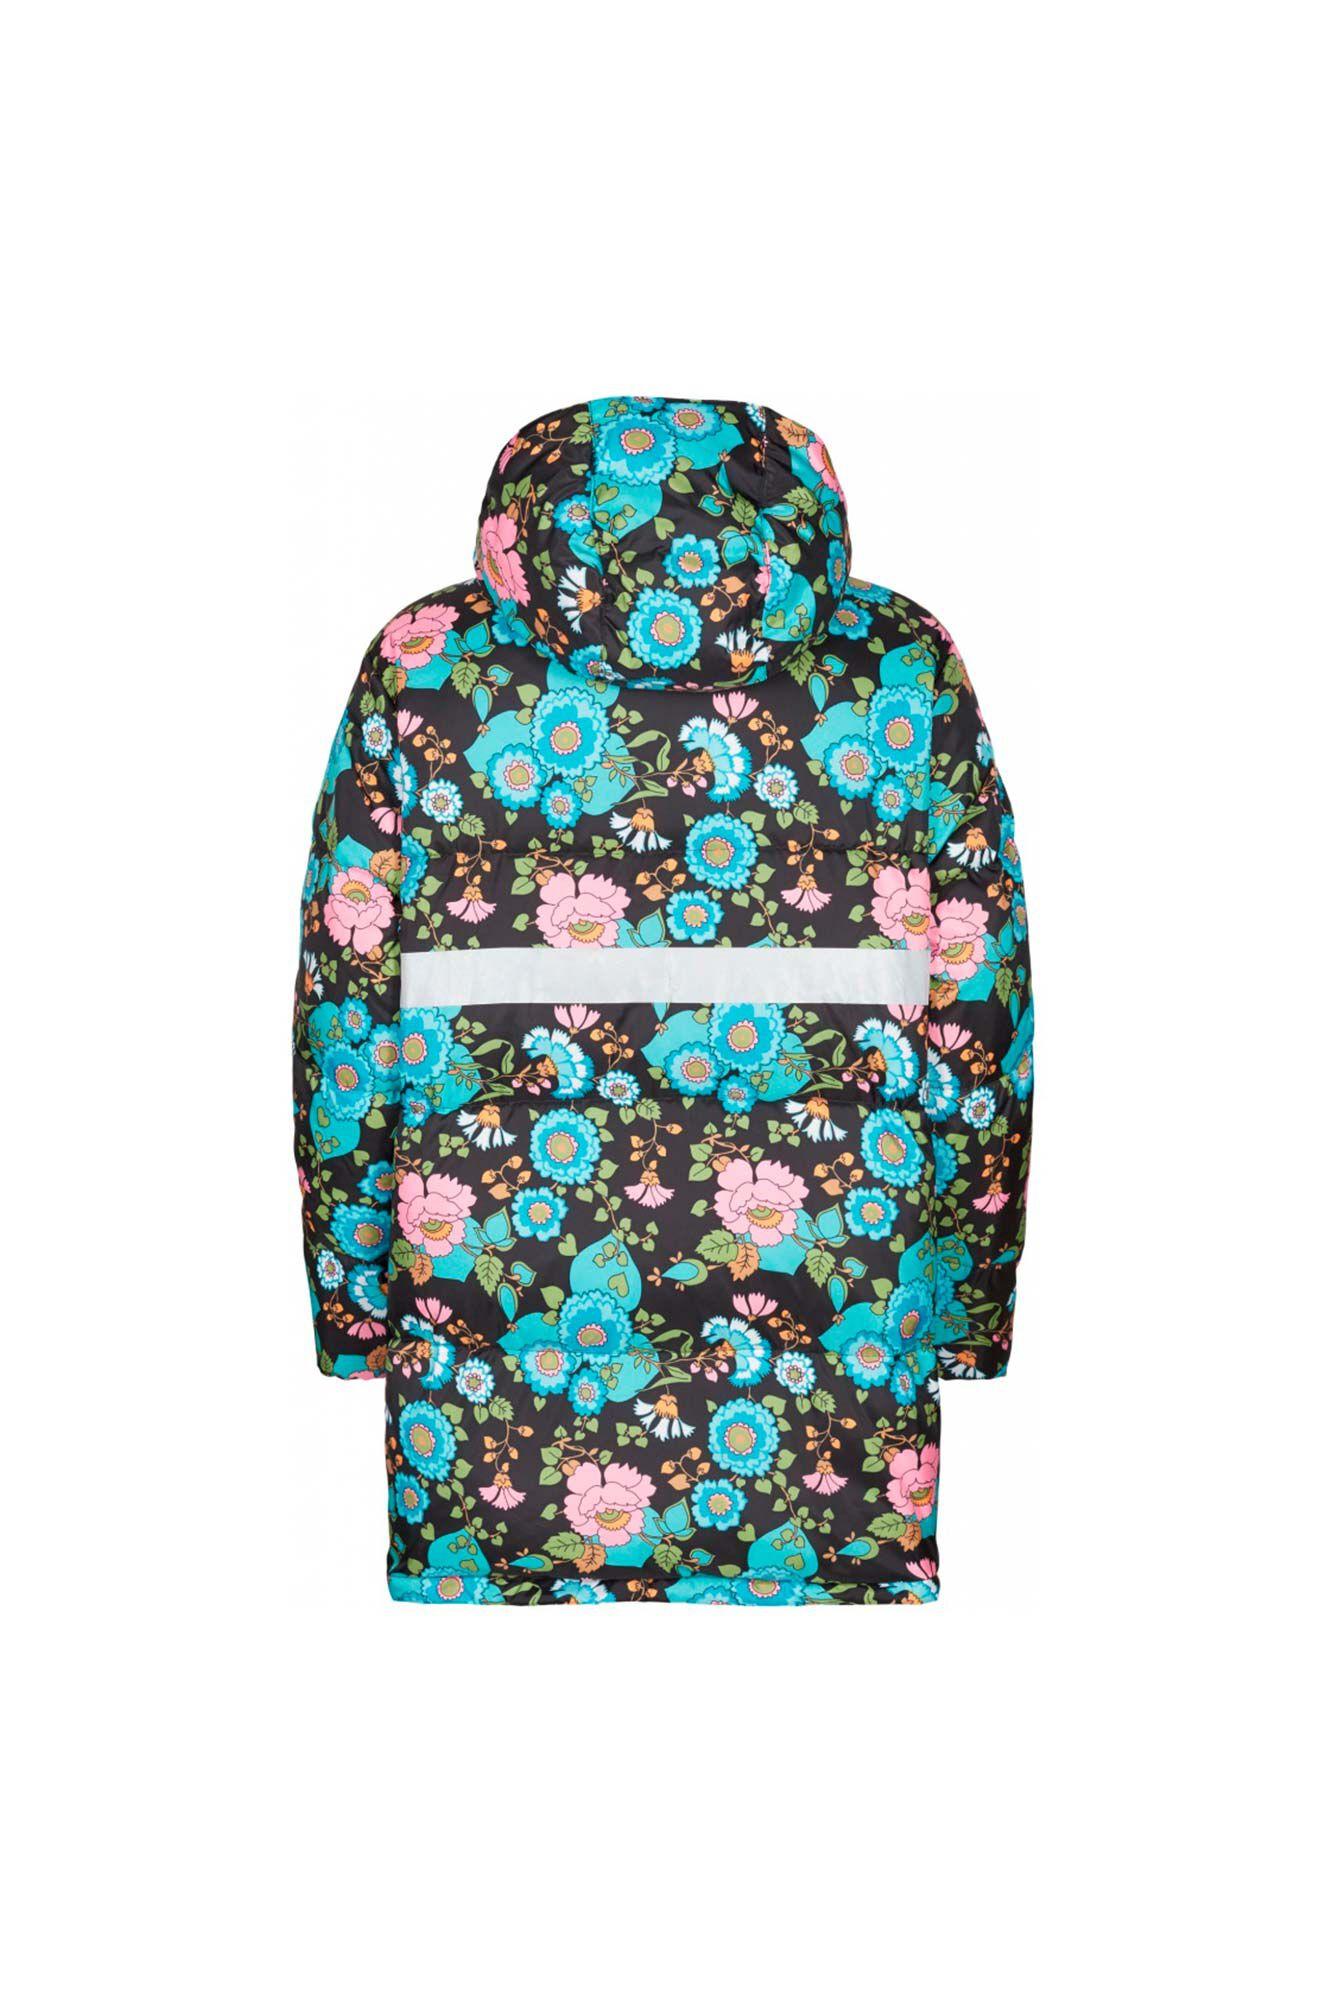 Grow up jacket FA900002-1